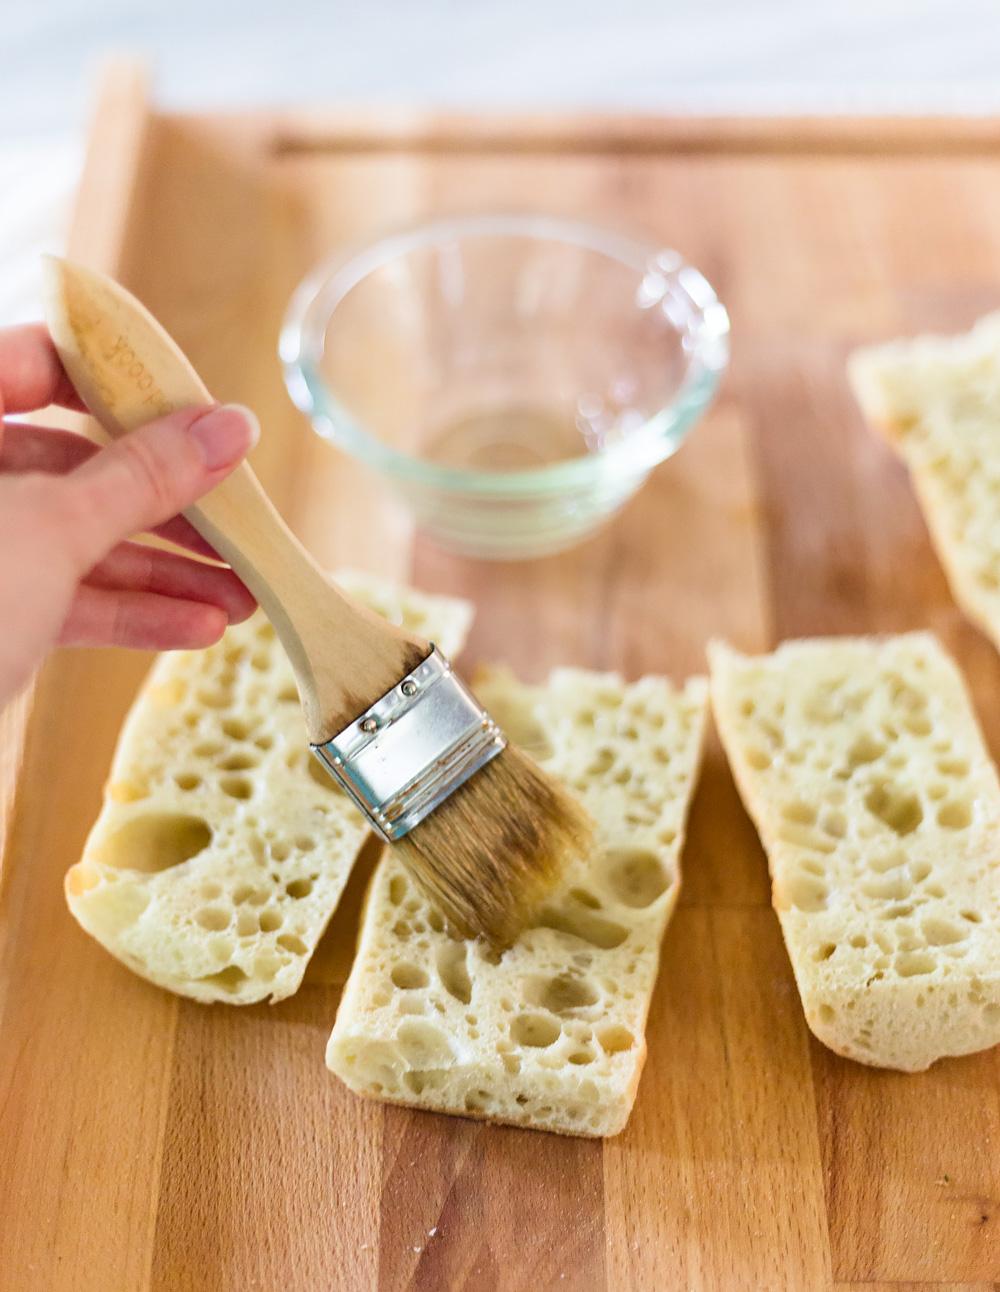 spreading oil on bread